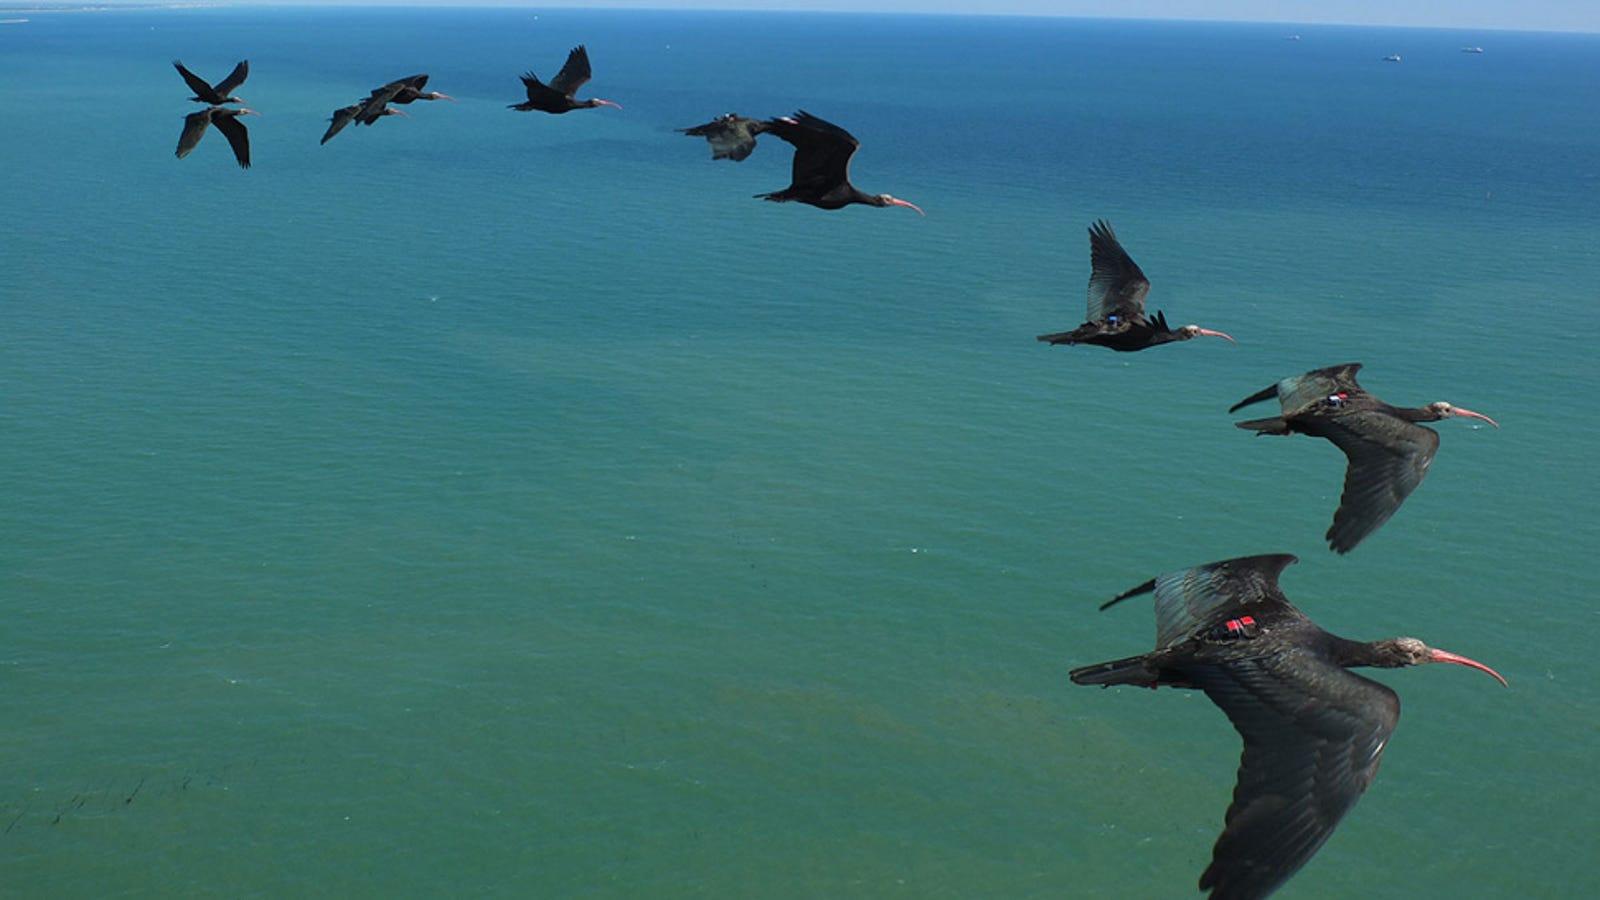 Bird Flight Patterns Magnificent Inspiration